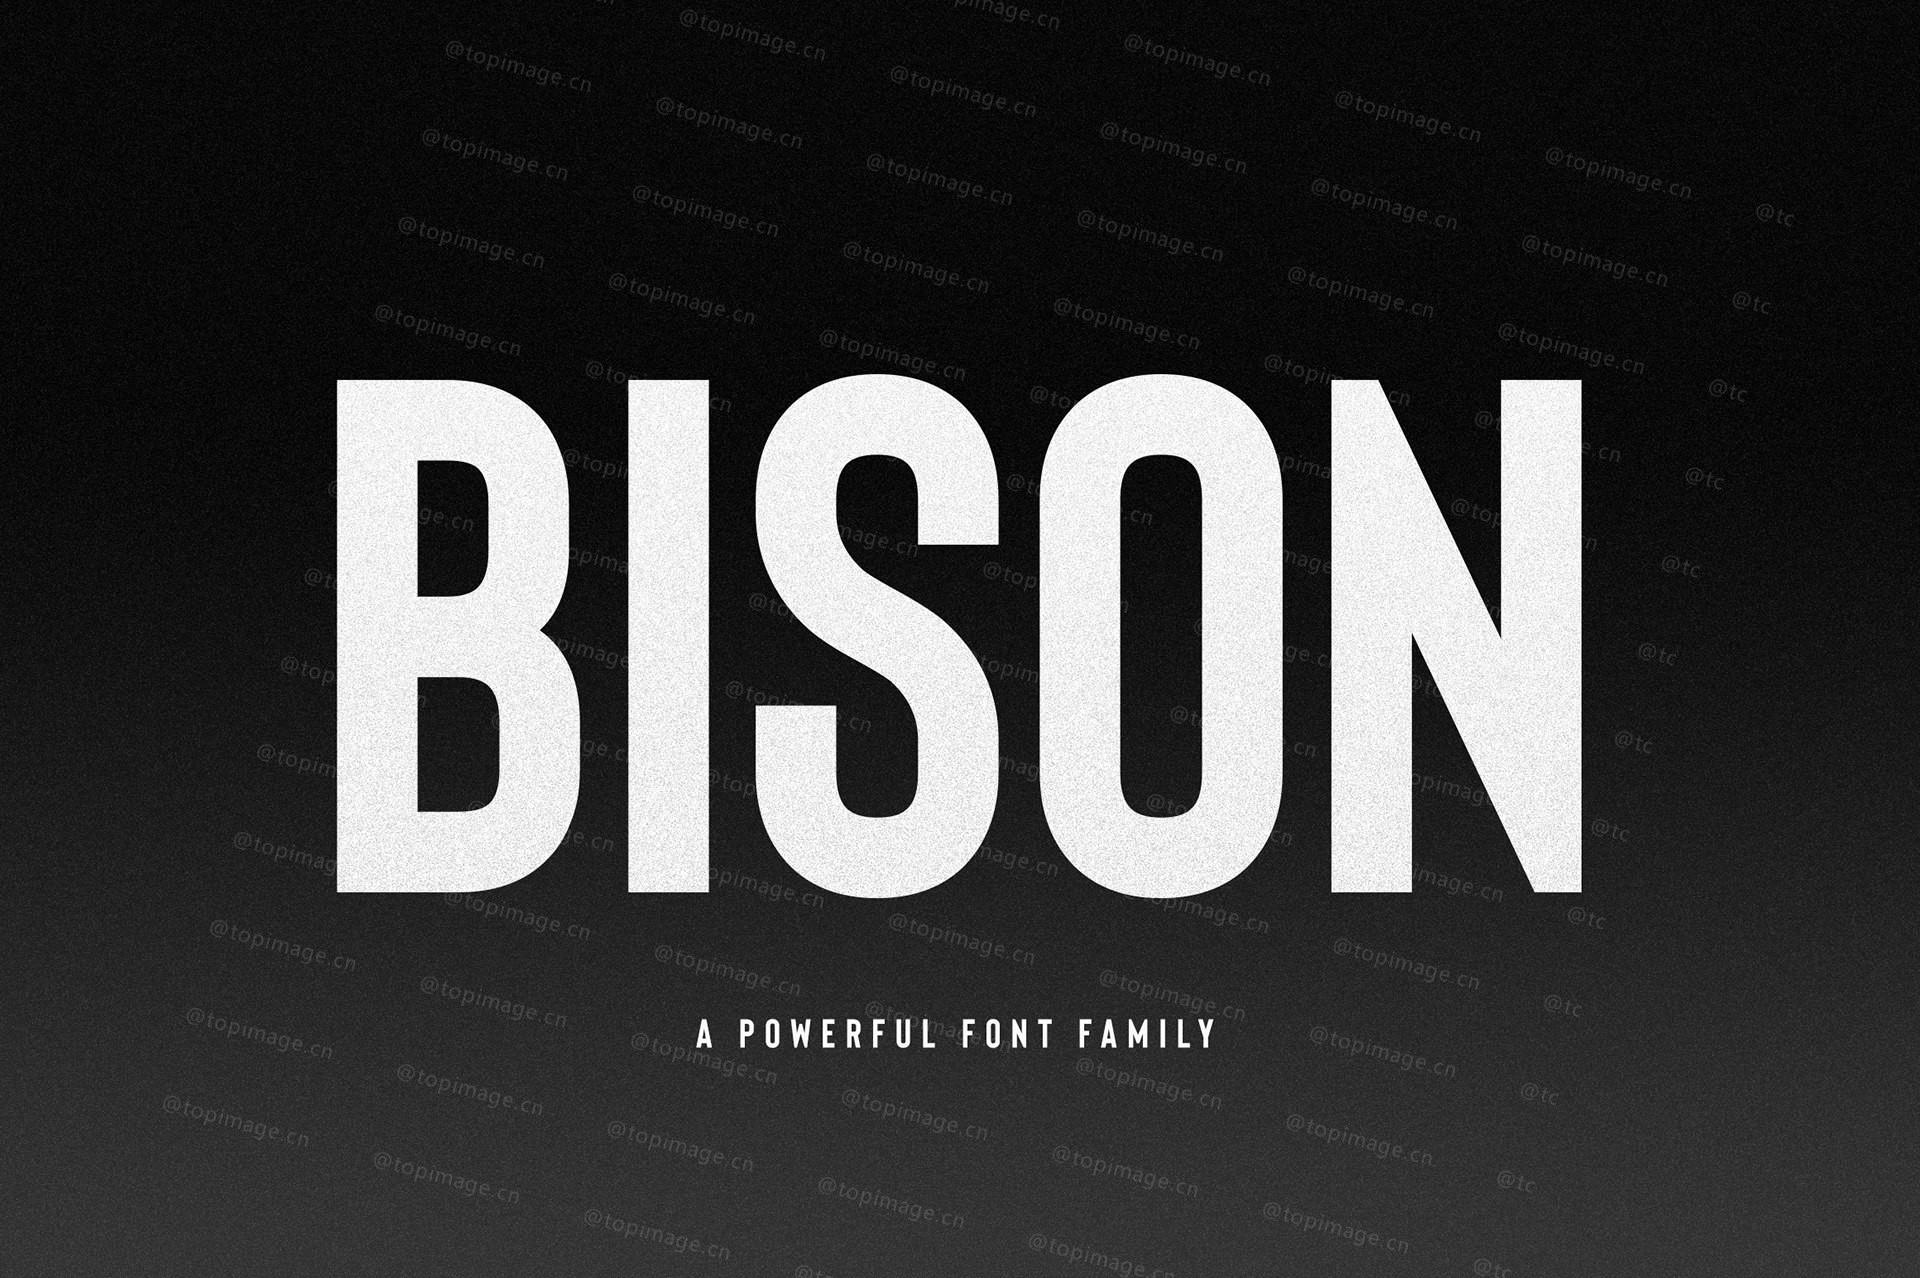 Bison现代有力量适合logo标志设计英文字体下载